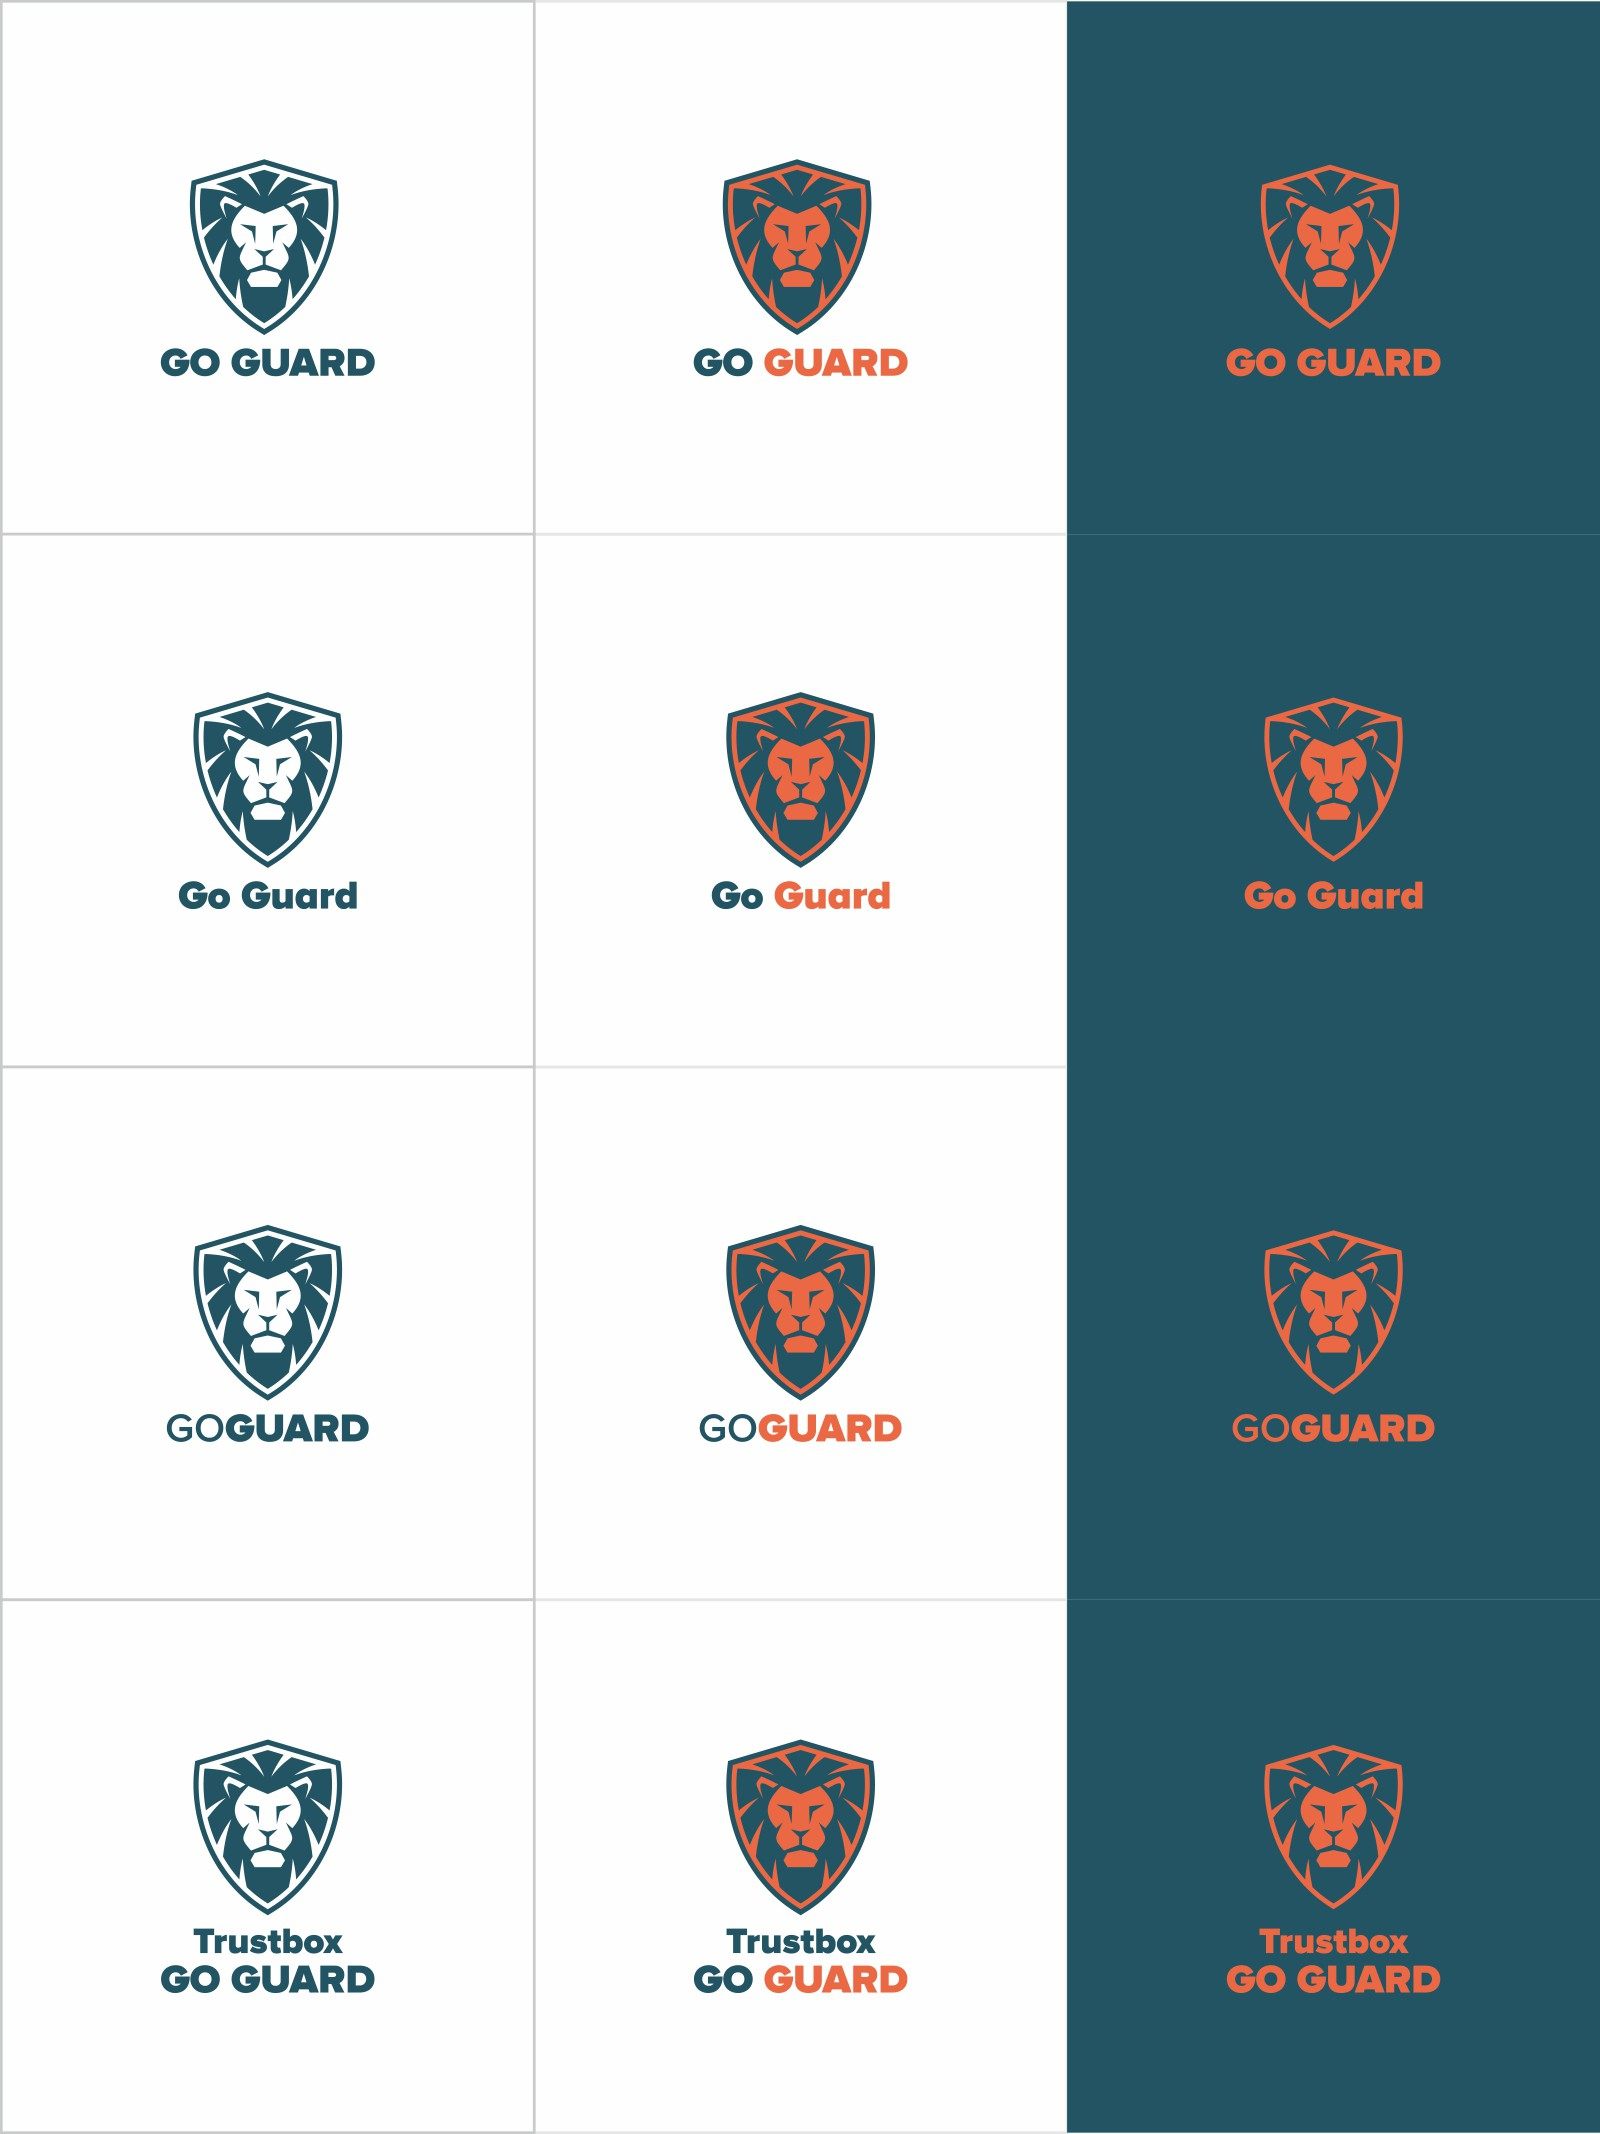 Lion design for Go Guard